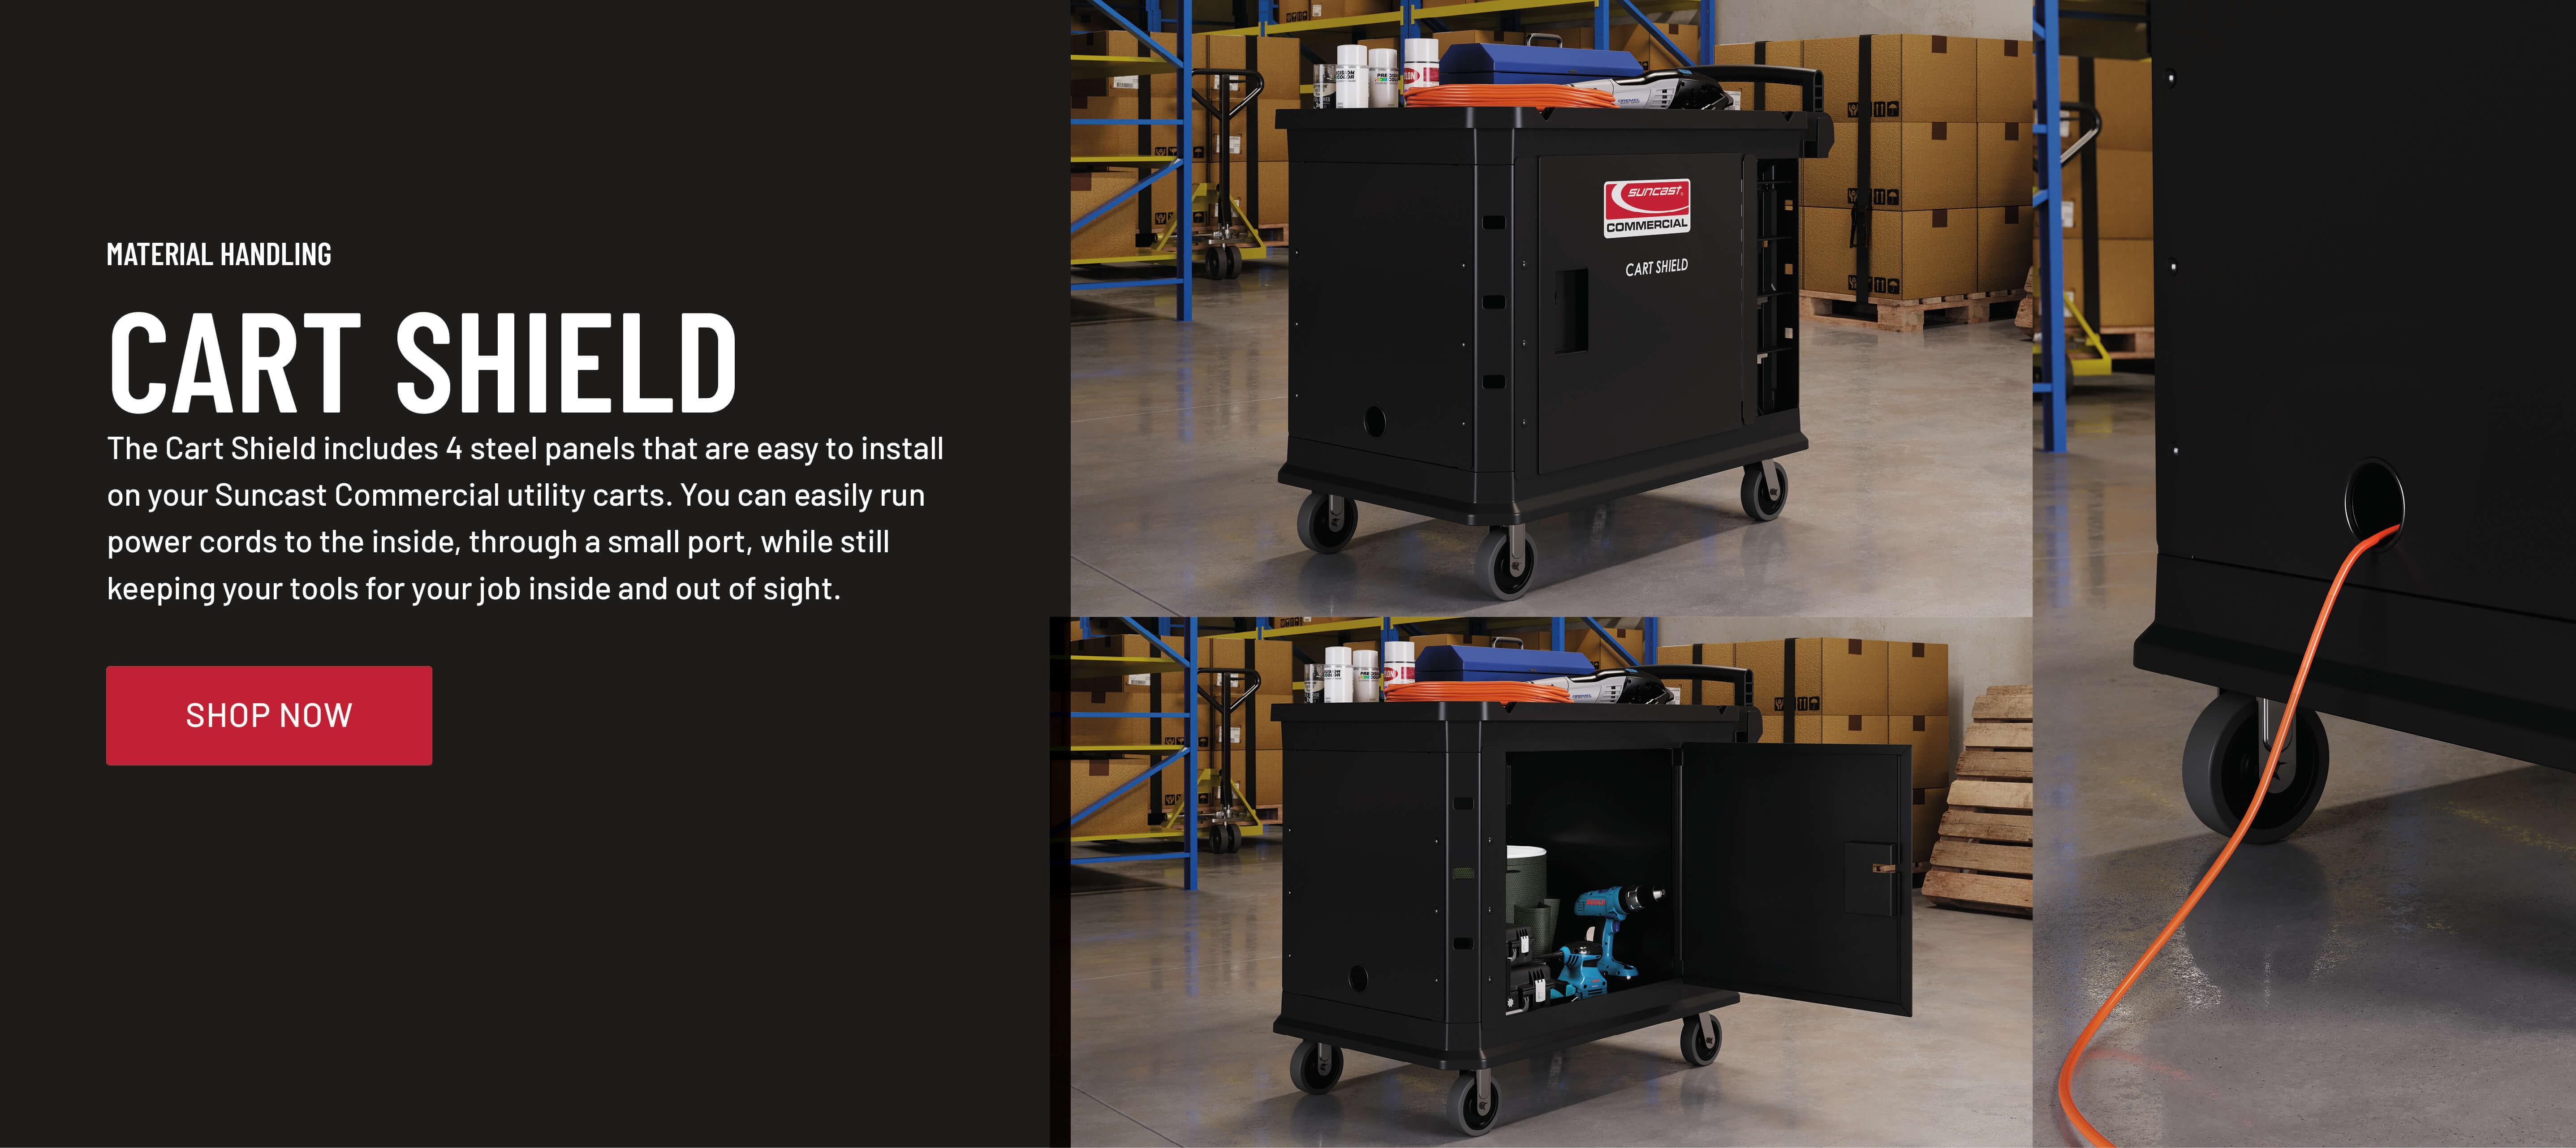 Cart Shield | Suncast Commercial Products